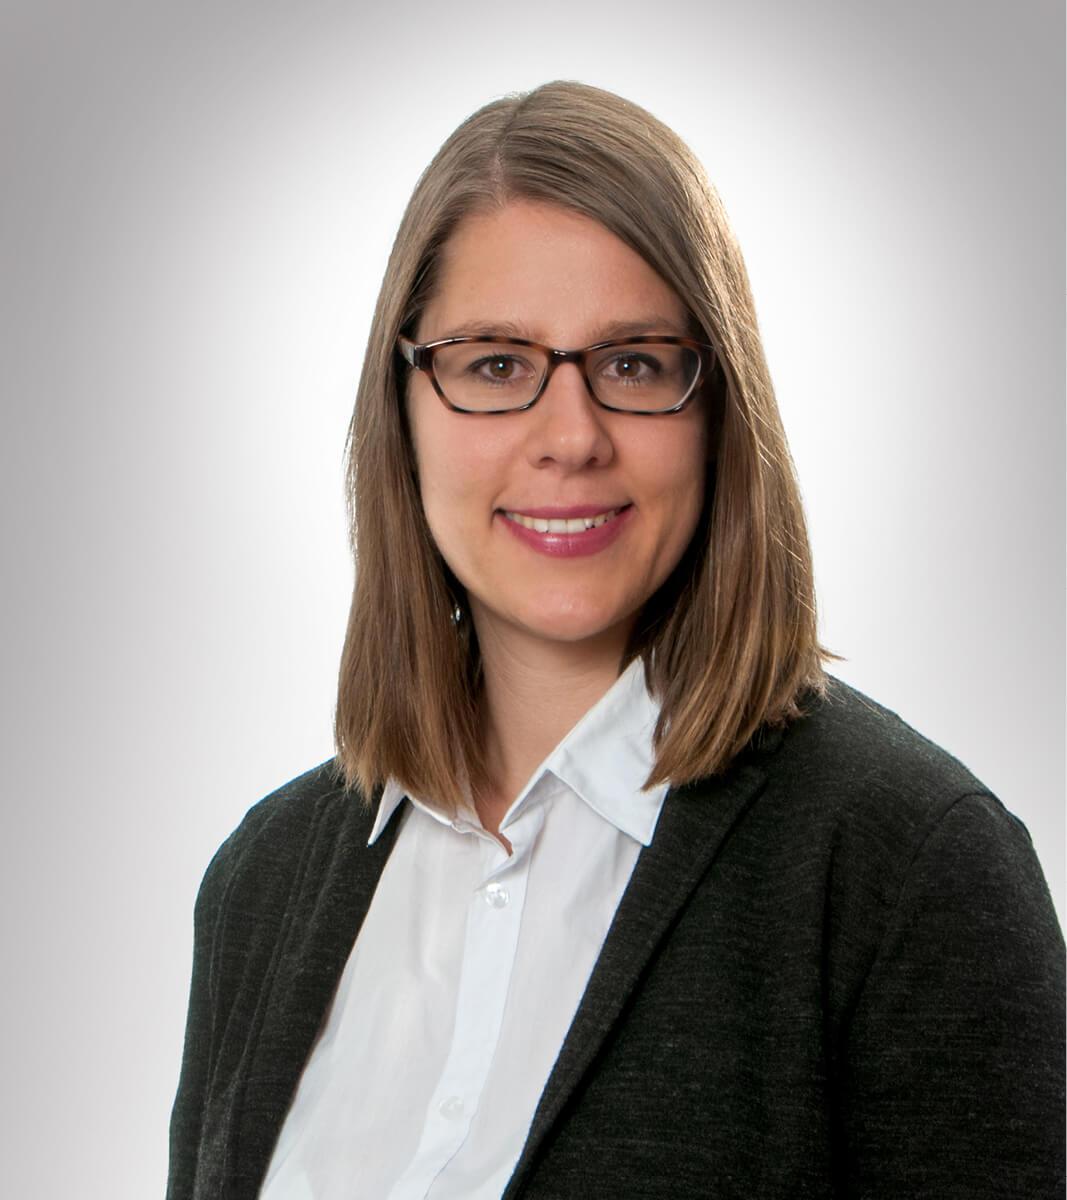 Cornelia Witt Diätassistentin bei Dorfner Catering